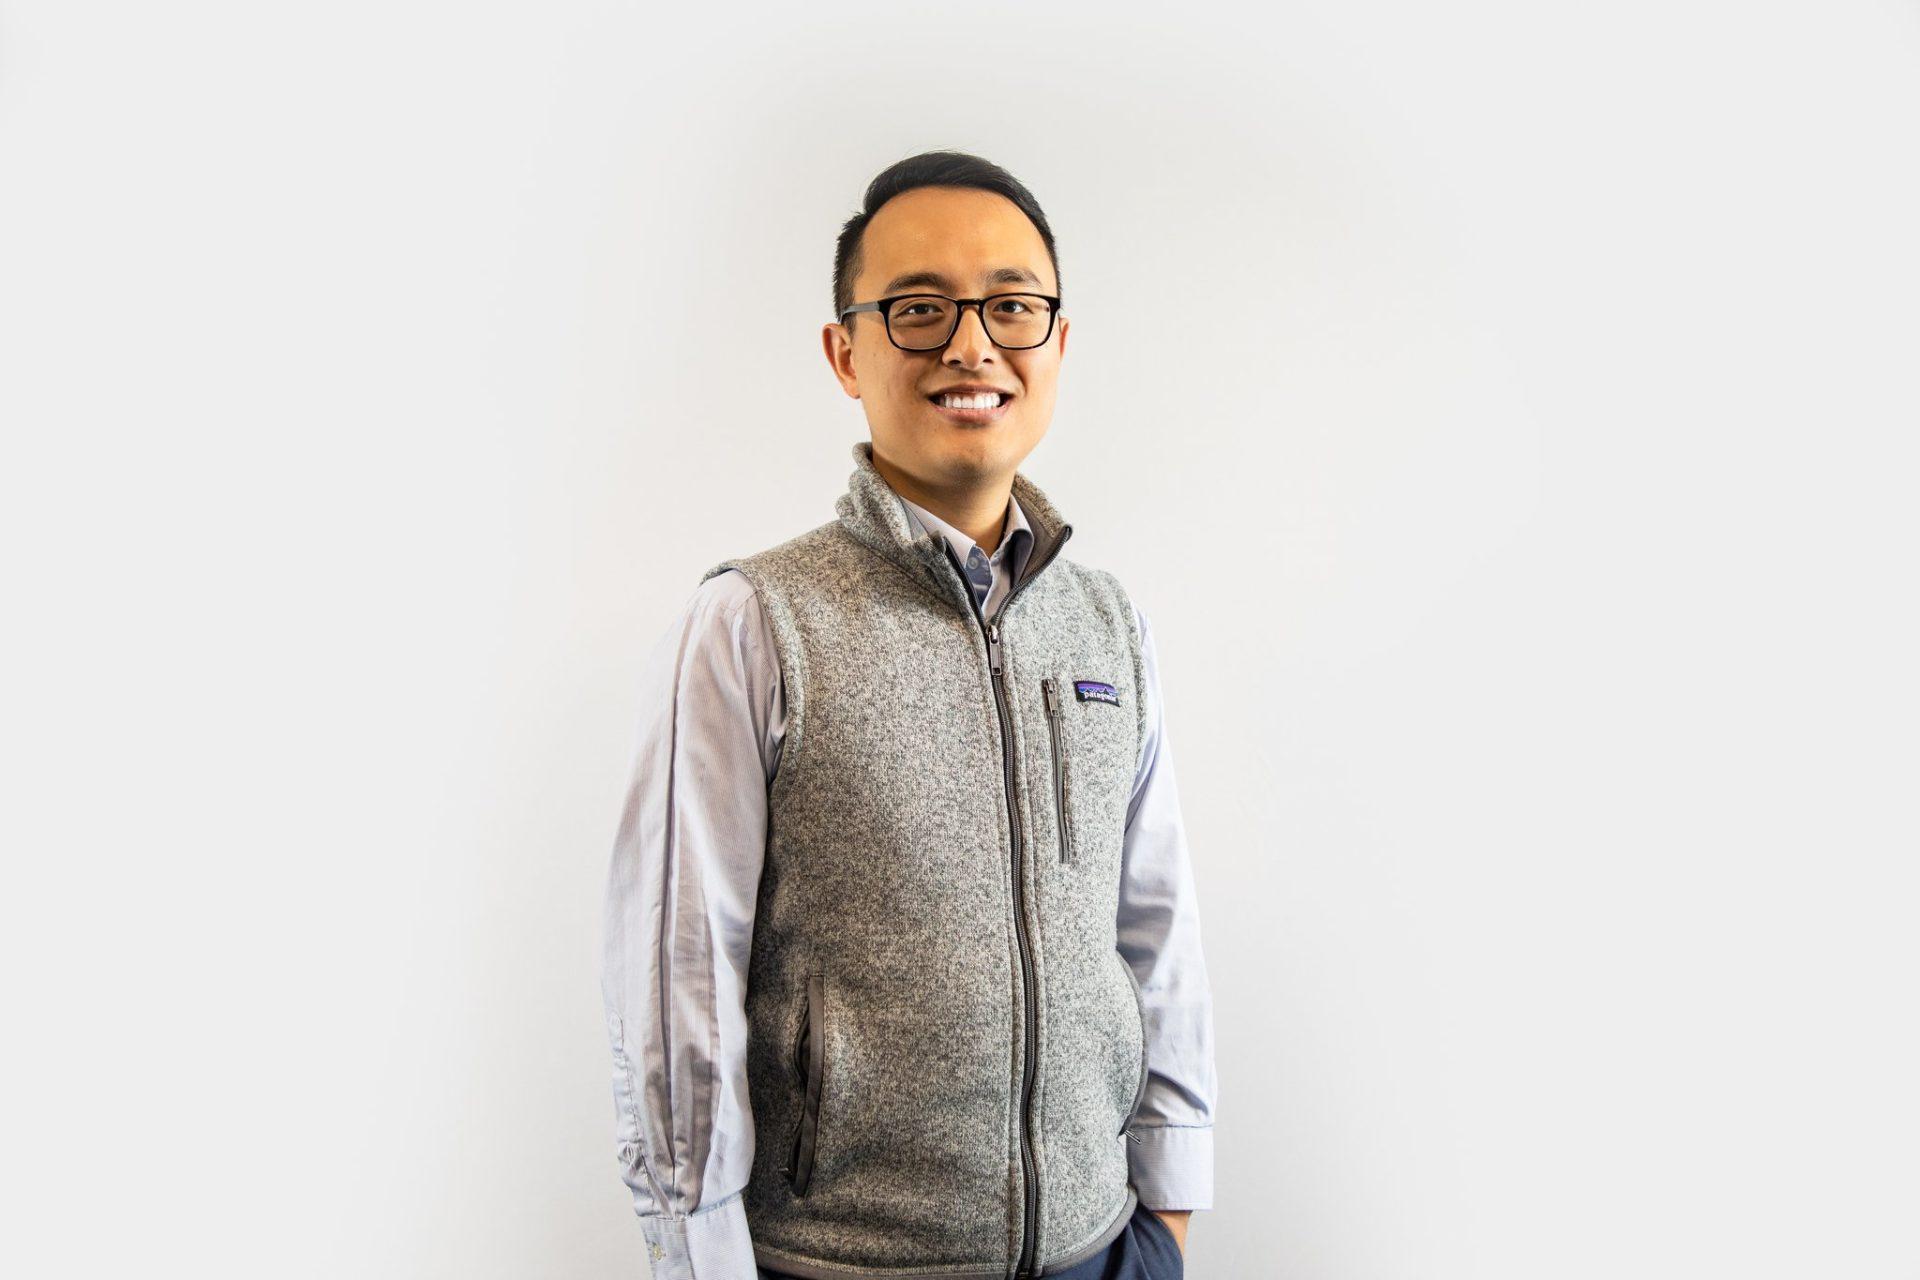 Zachary Wang